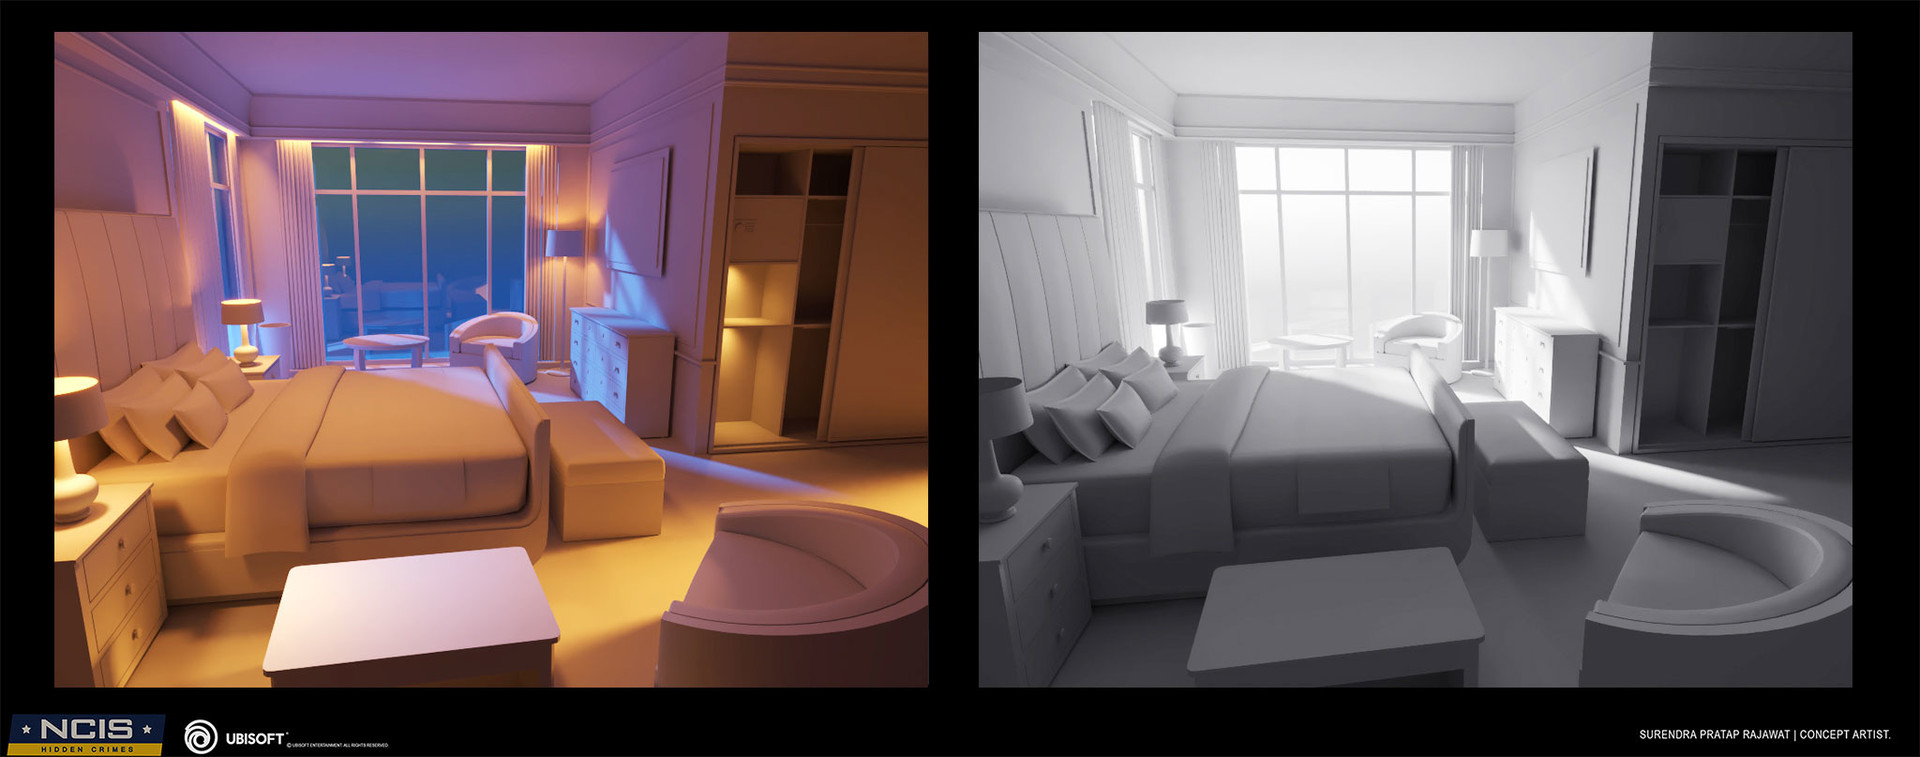 Surendra rajawat hotel room process